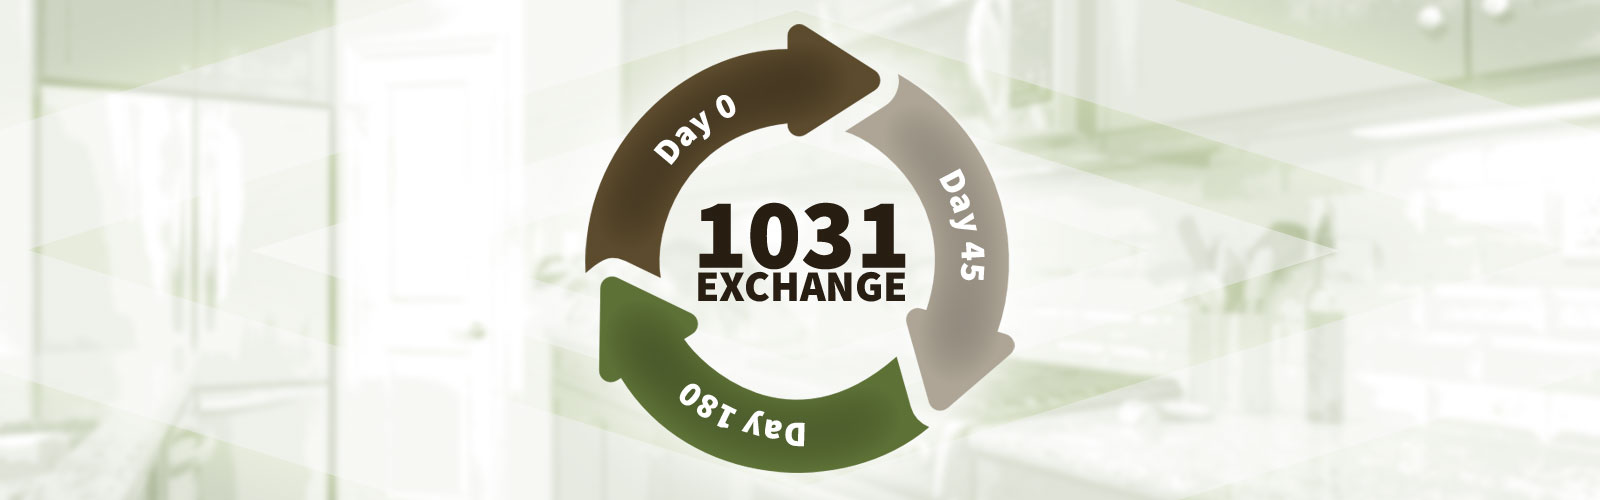 1031 Exchange - How Real Estate Investors Defer Capital Gains Tax